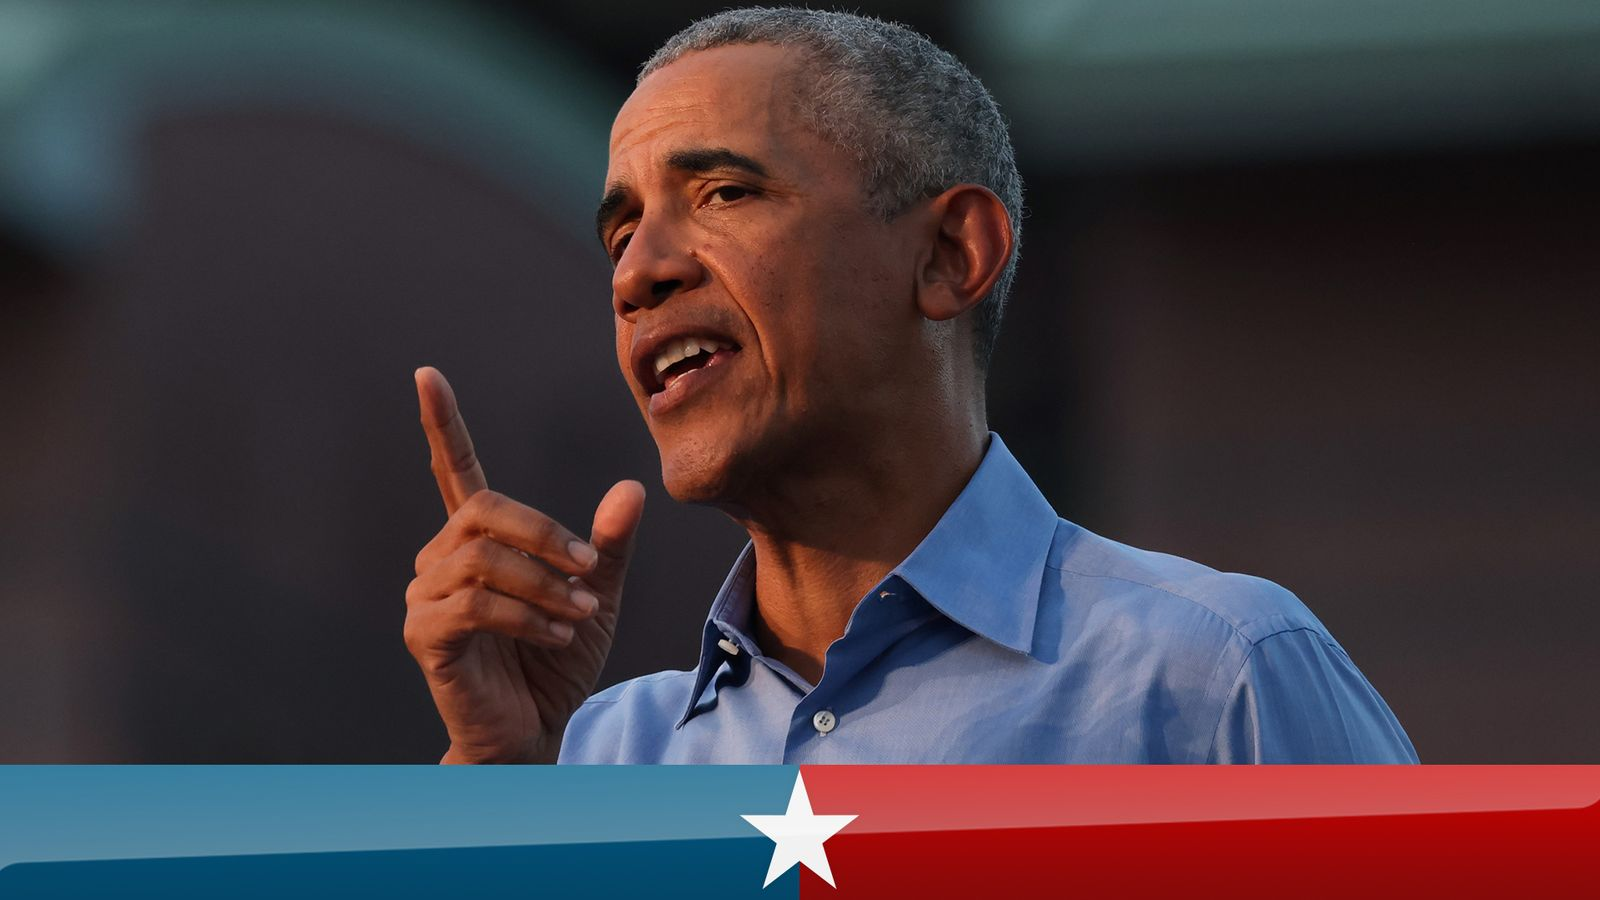 US election 2020: Barack Obama attacks Donald Trump for 'ignoring' coronavirus pandemic at Joe Biden rally